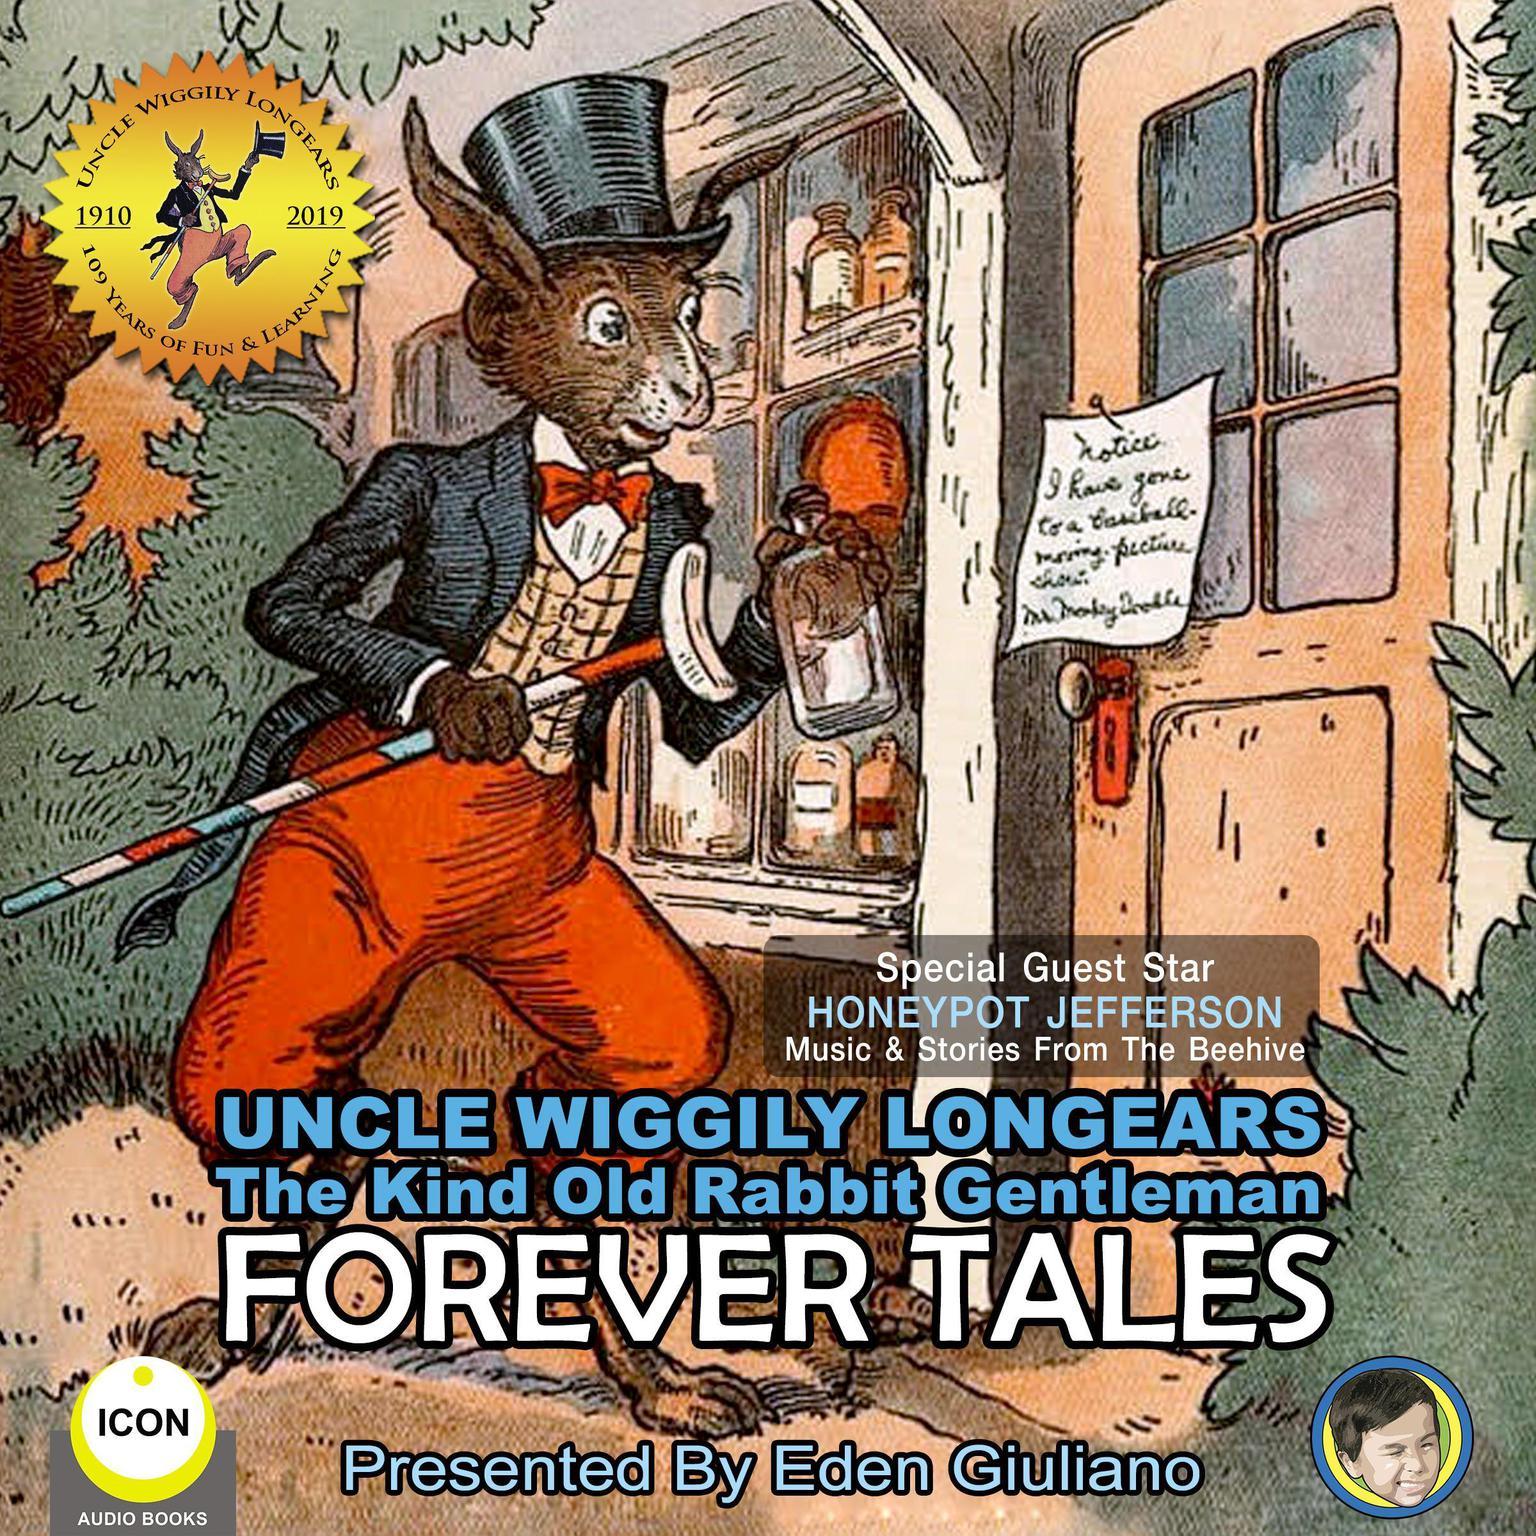 Uncle Wiggily Longears The Kind Old Rabbit Gentleman - Forever Tales Audiobook, by Howard Garis